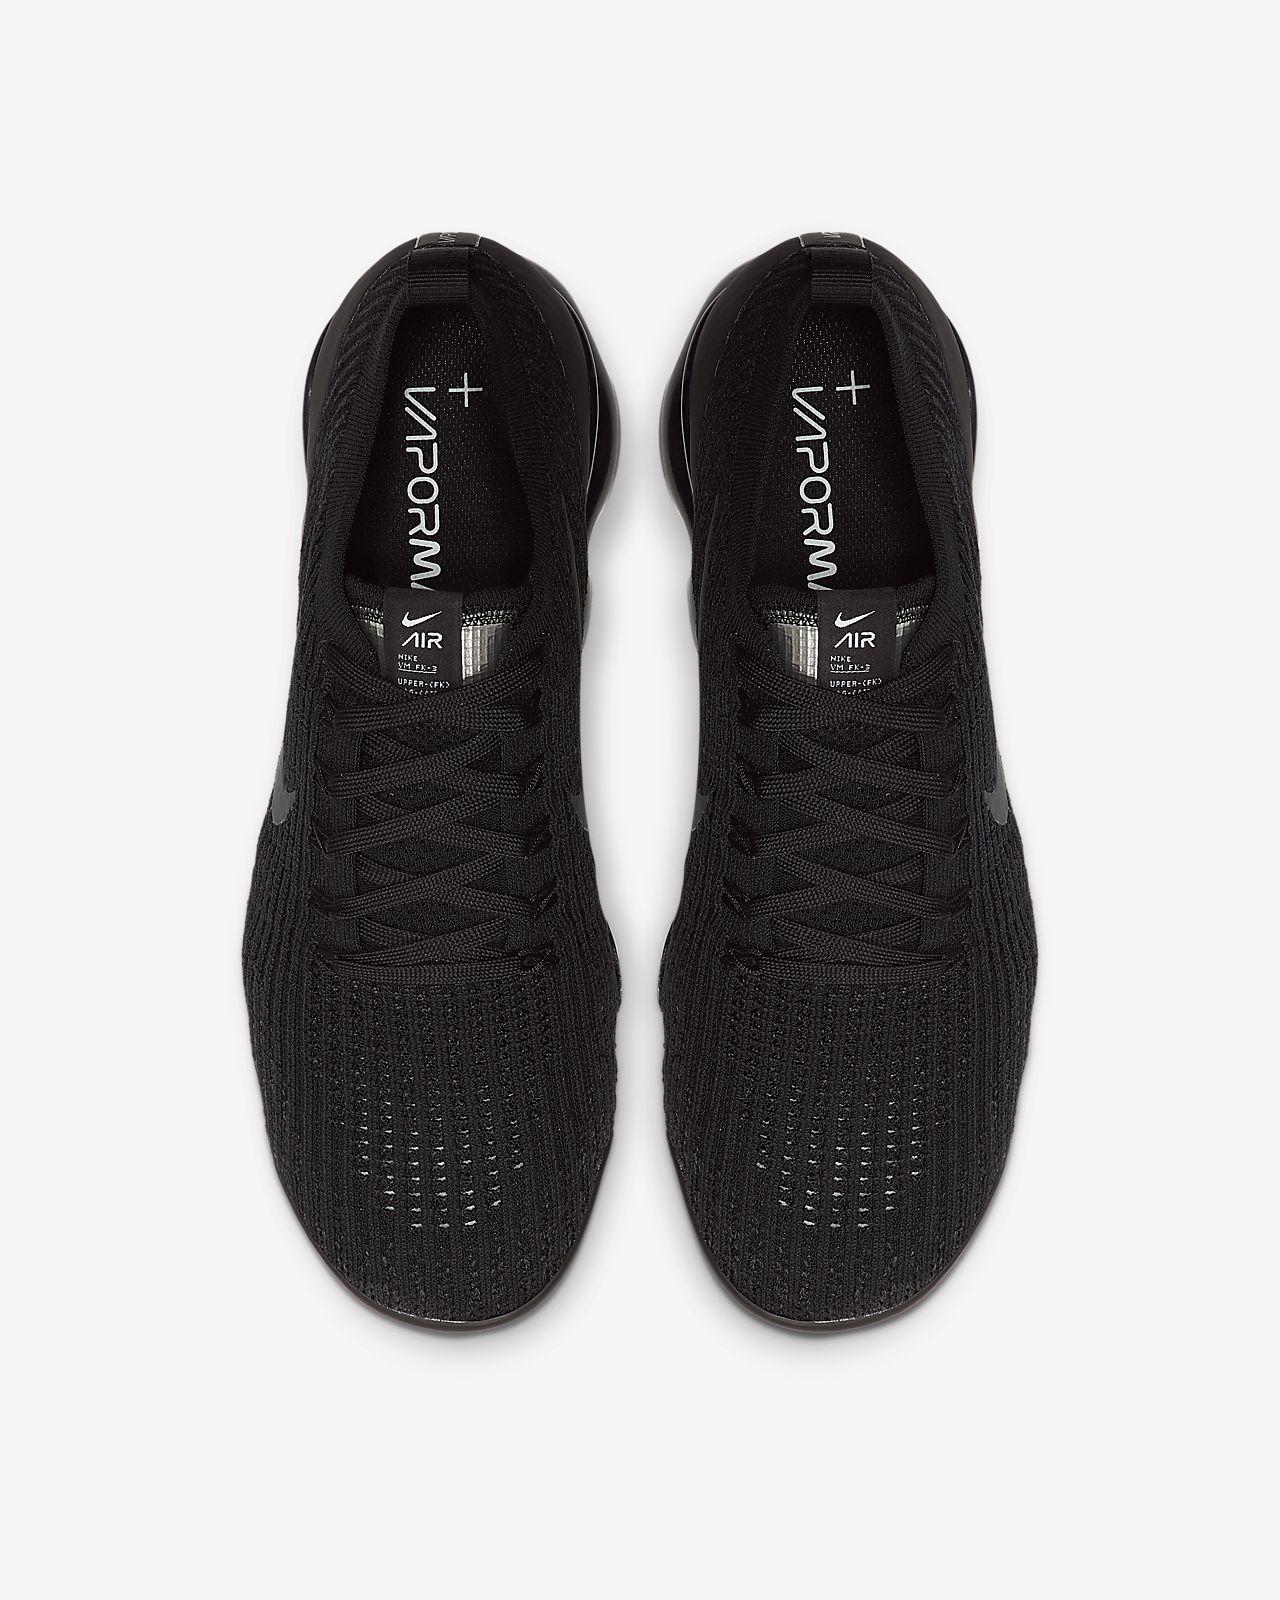 dbad89c08bb9 Nike Air VaporMax Flyknit 3 Men s Shoe. Nike.com CA